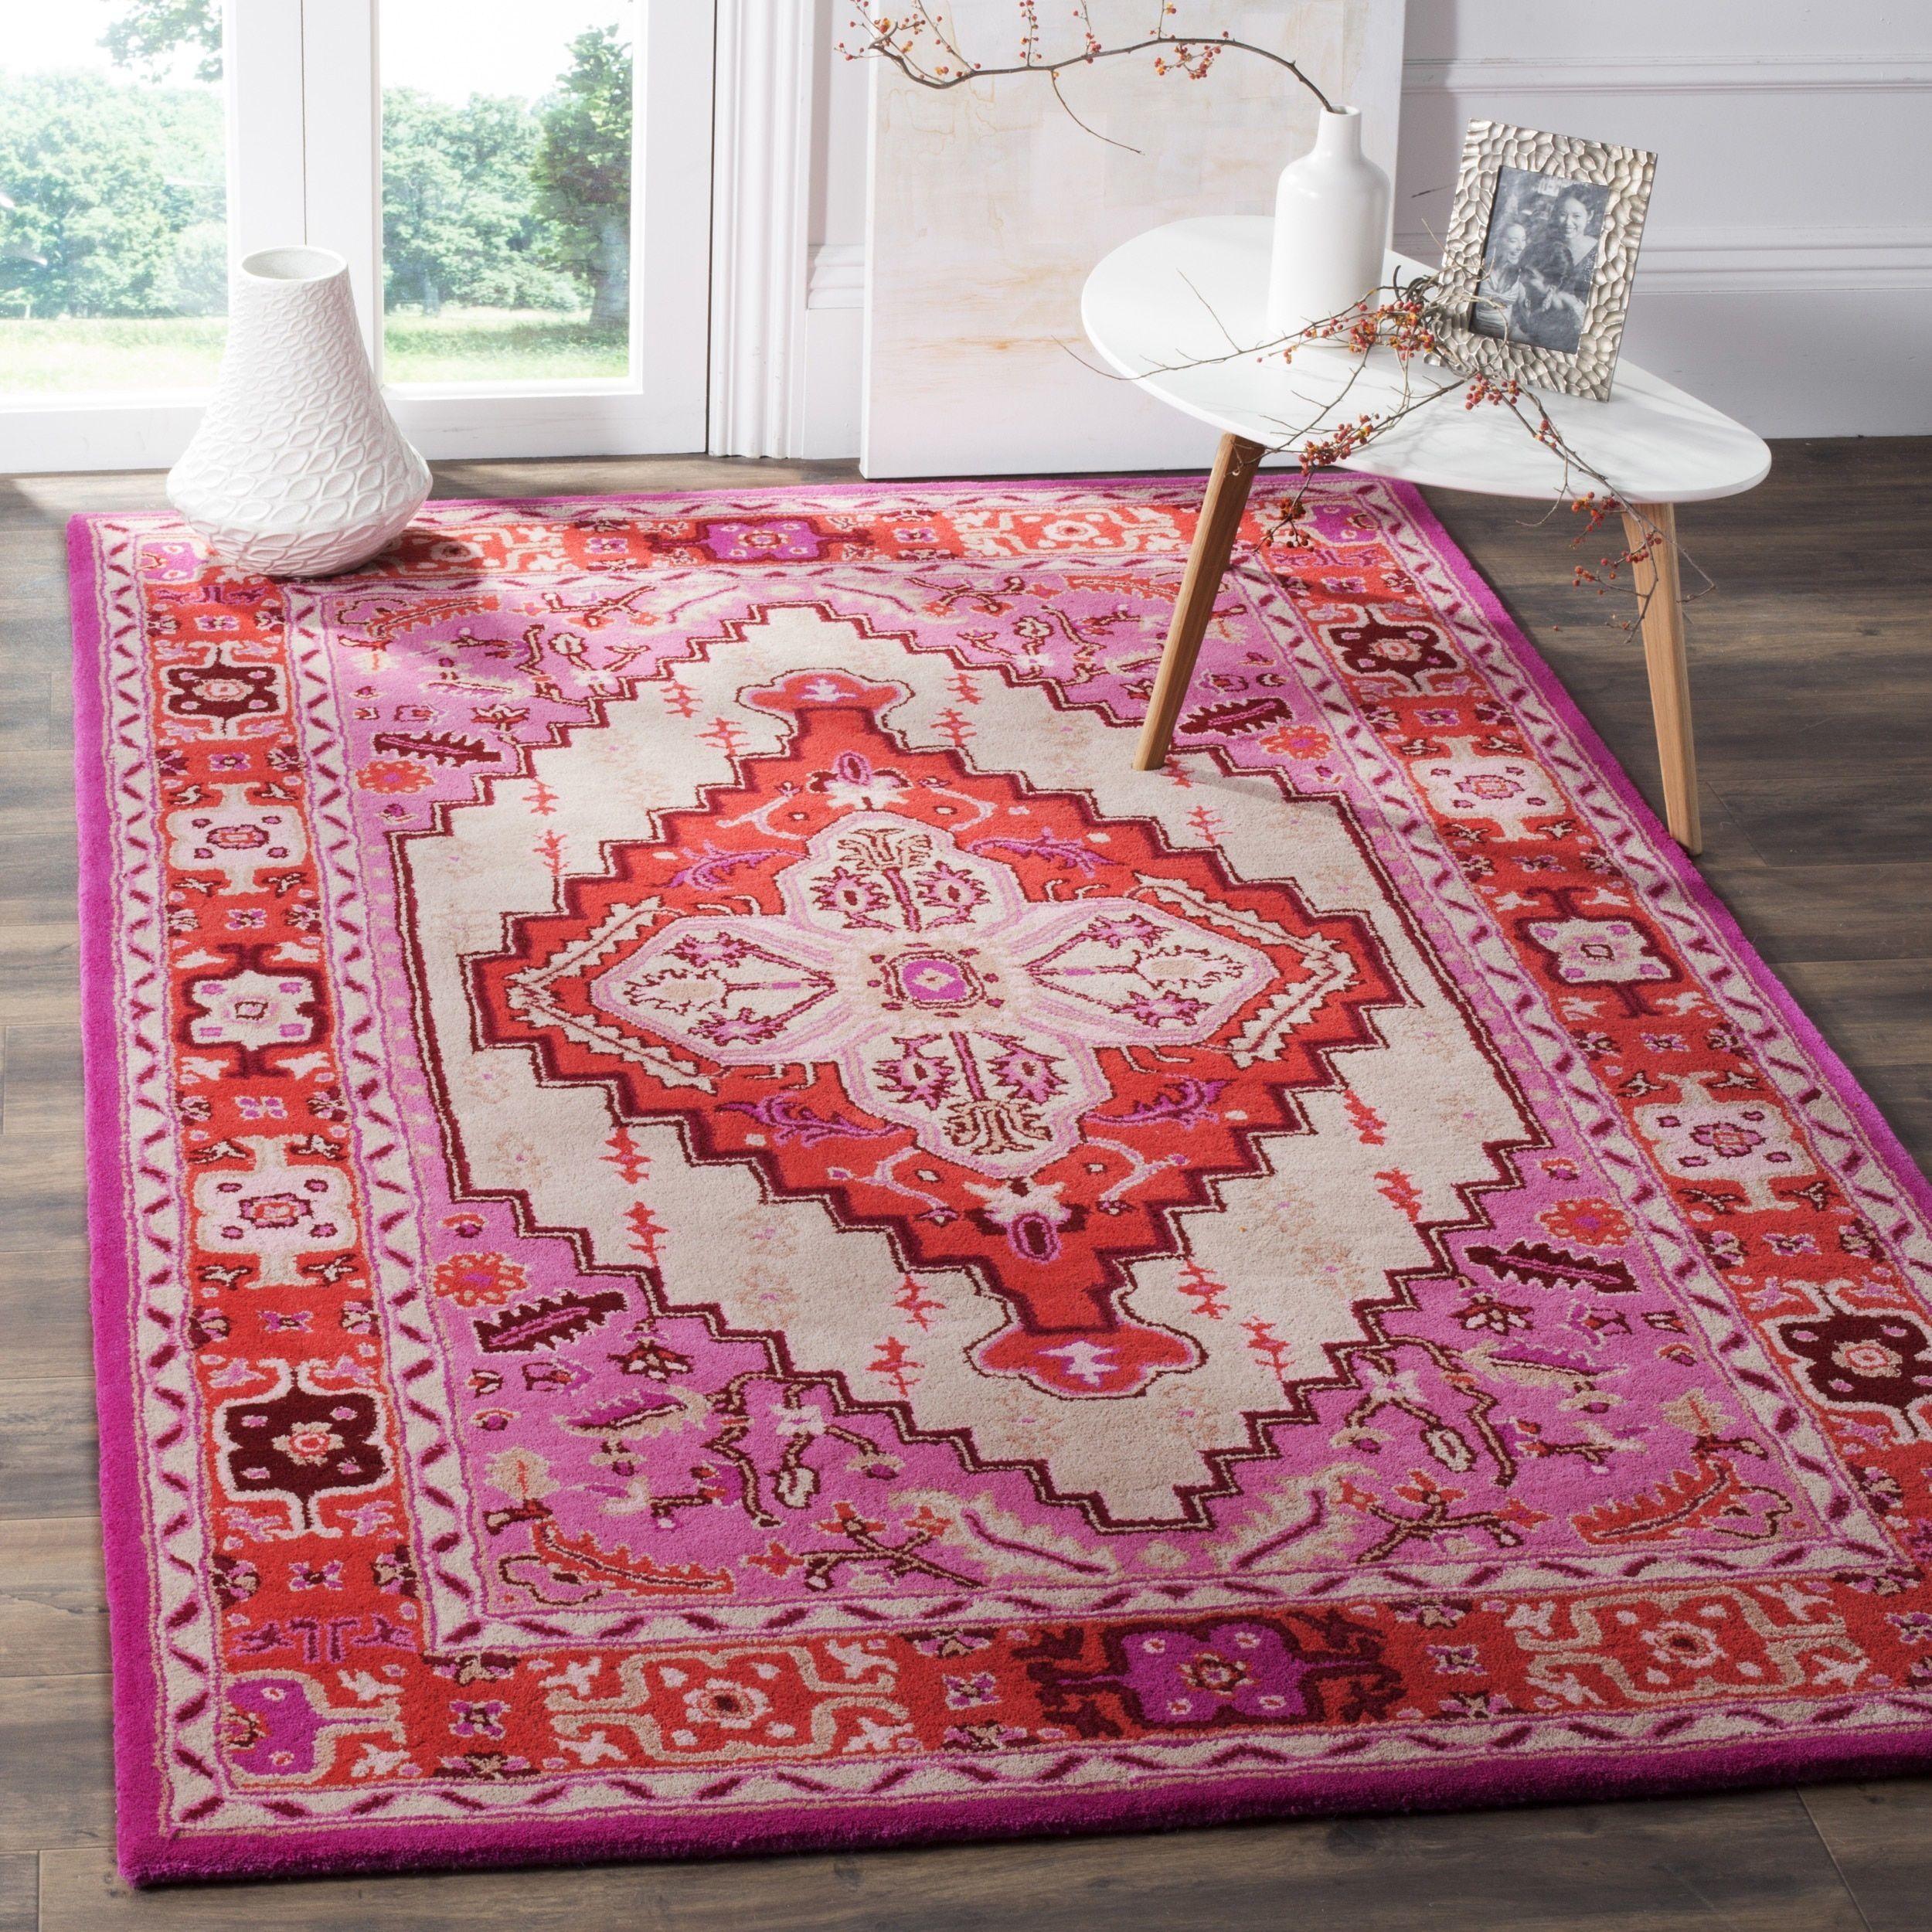 Safavieh Bellagio Handmade Bohemian Red Pink/ Ivory Wool Rug (6' x 9') (BLG545A-6), Size 6' x 9' (Viscose, Geometric)